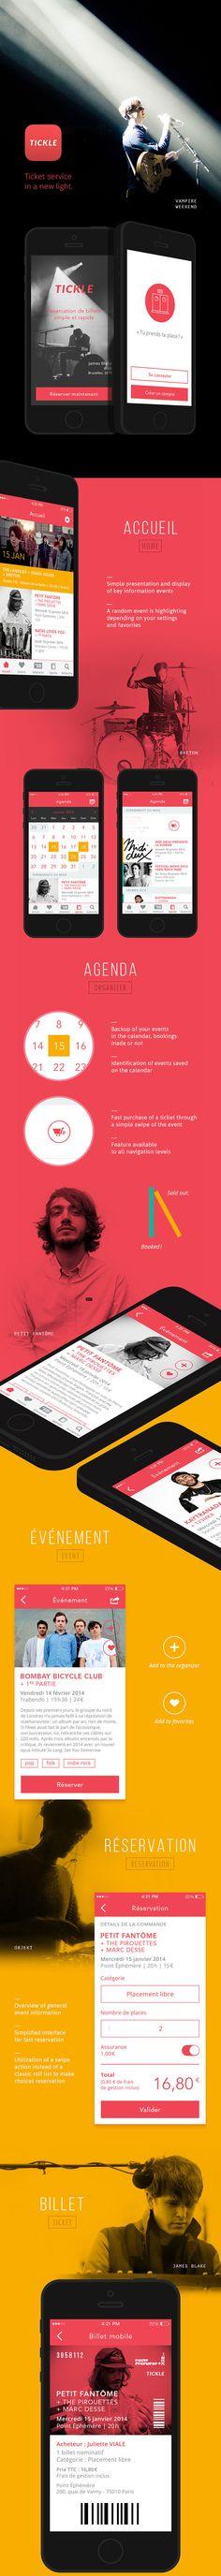 Tickle - Concept Mobile app